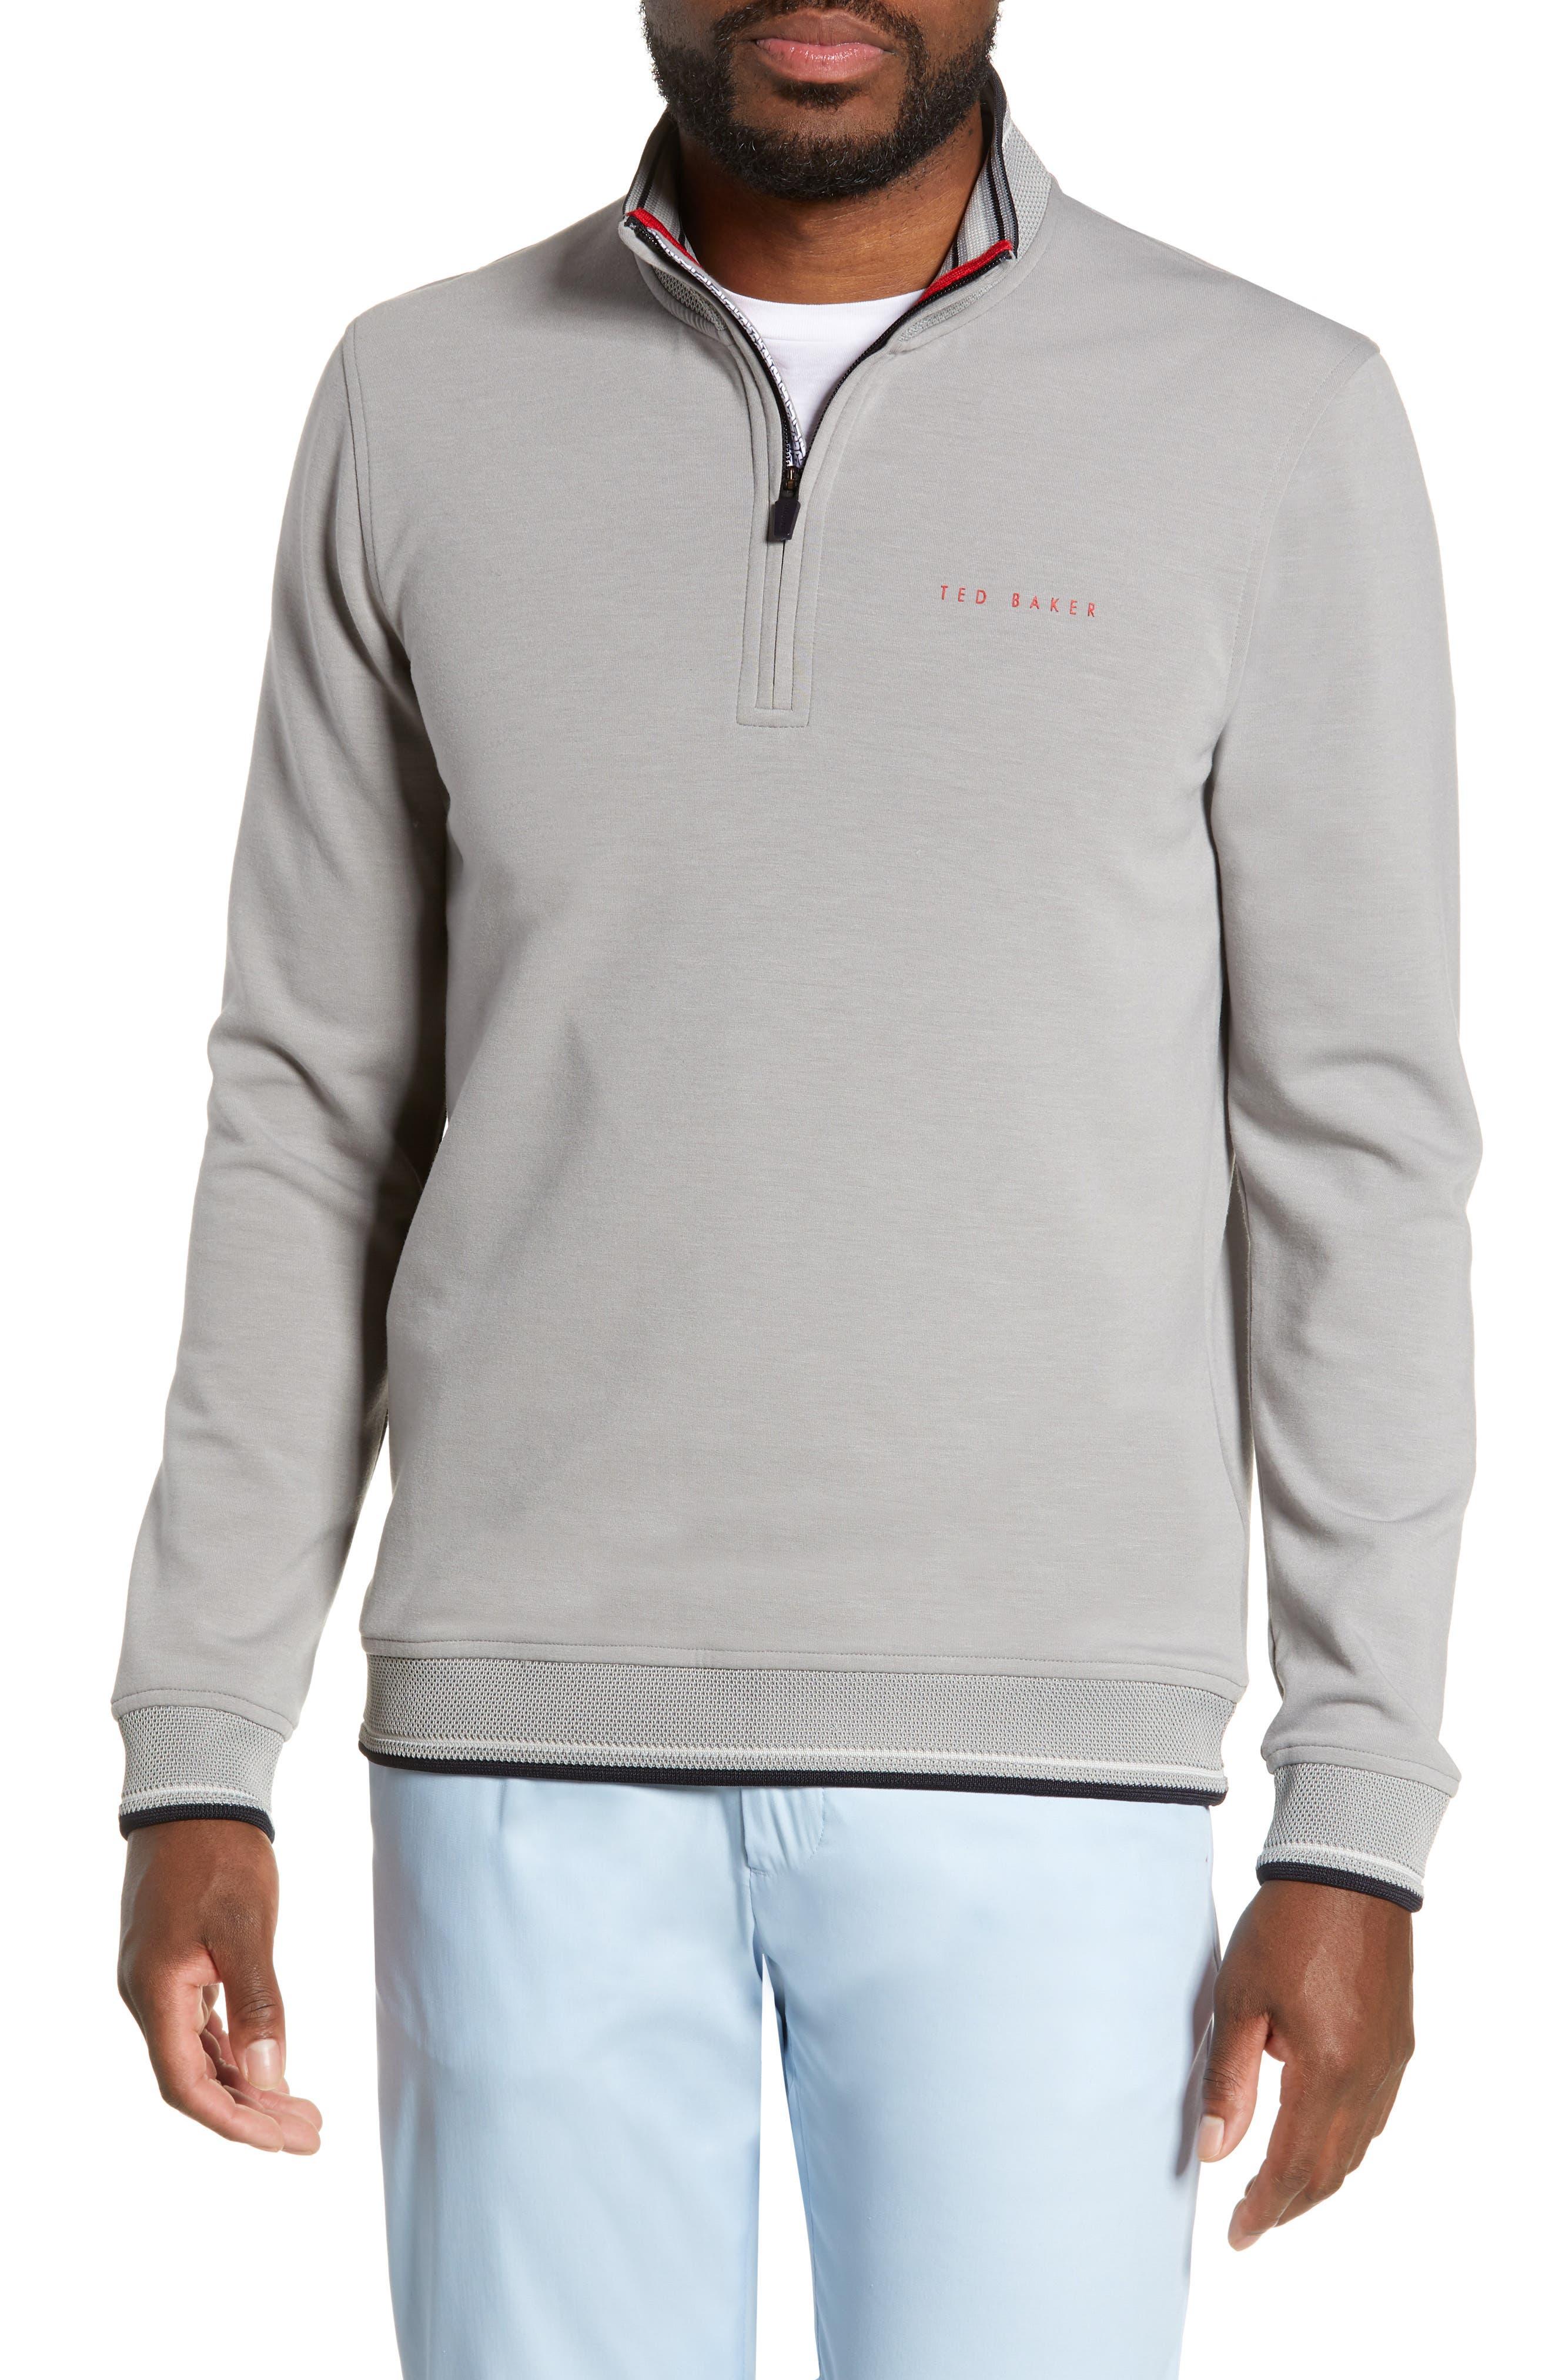 Image of Ted Baker London Peanot Golf Half Zip Slim Fit Sweatshirt